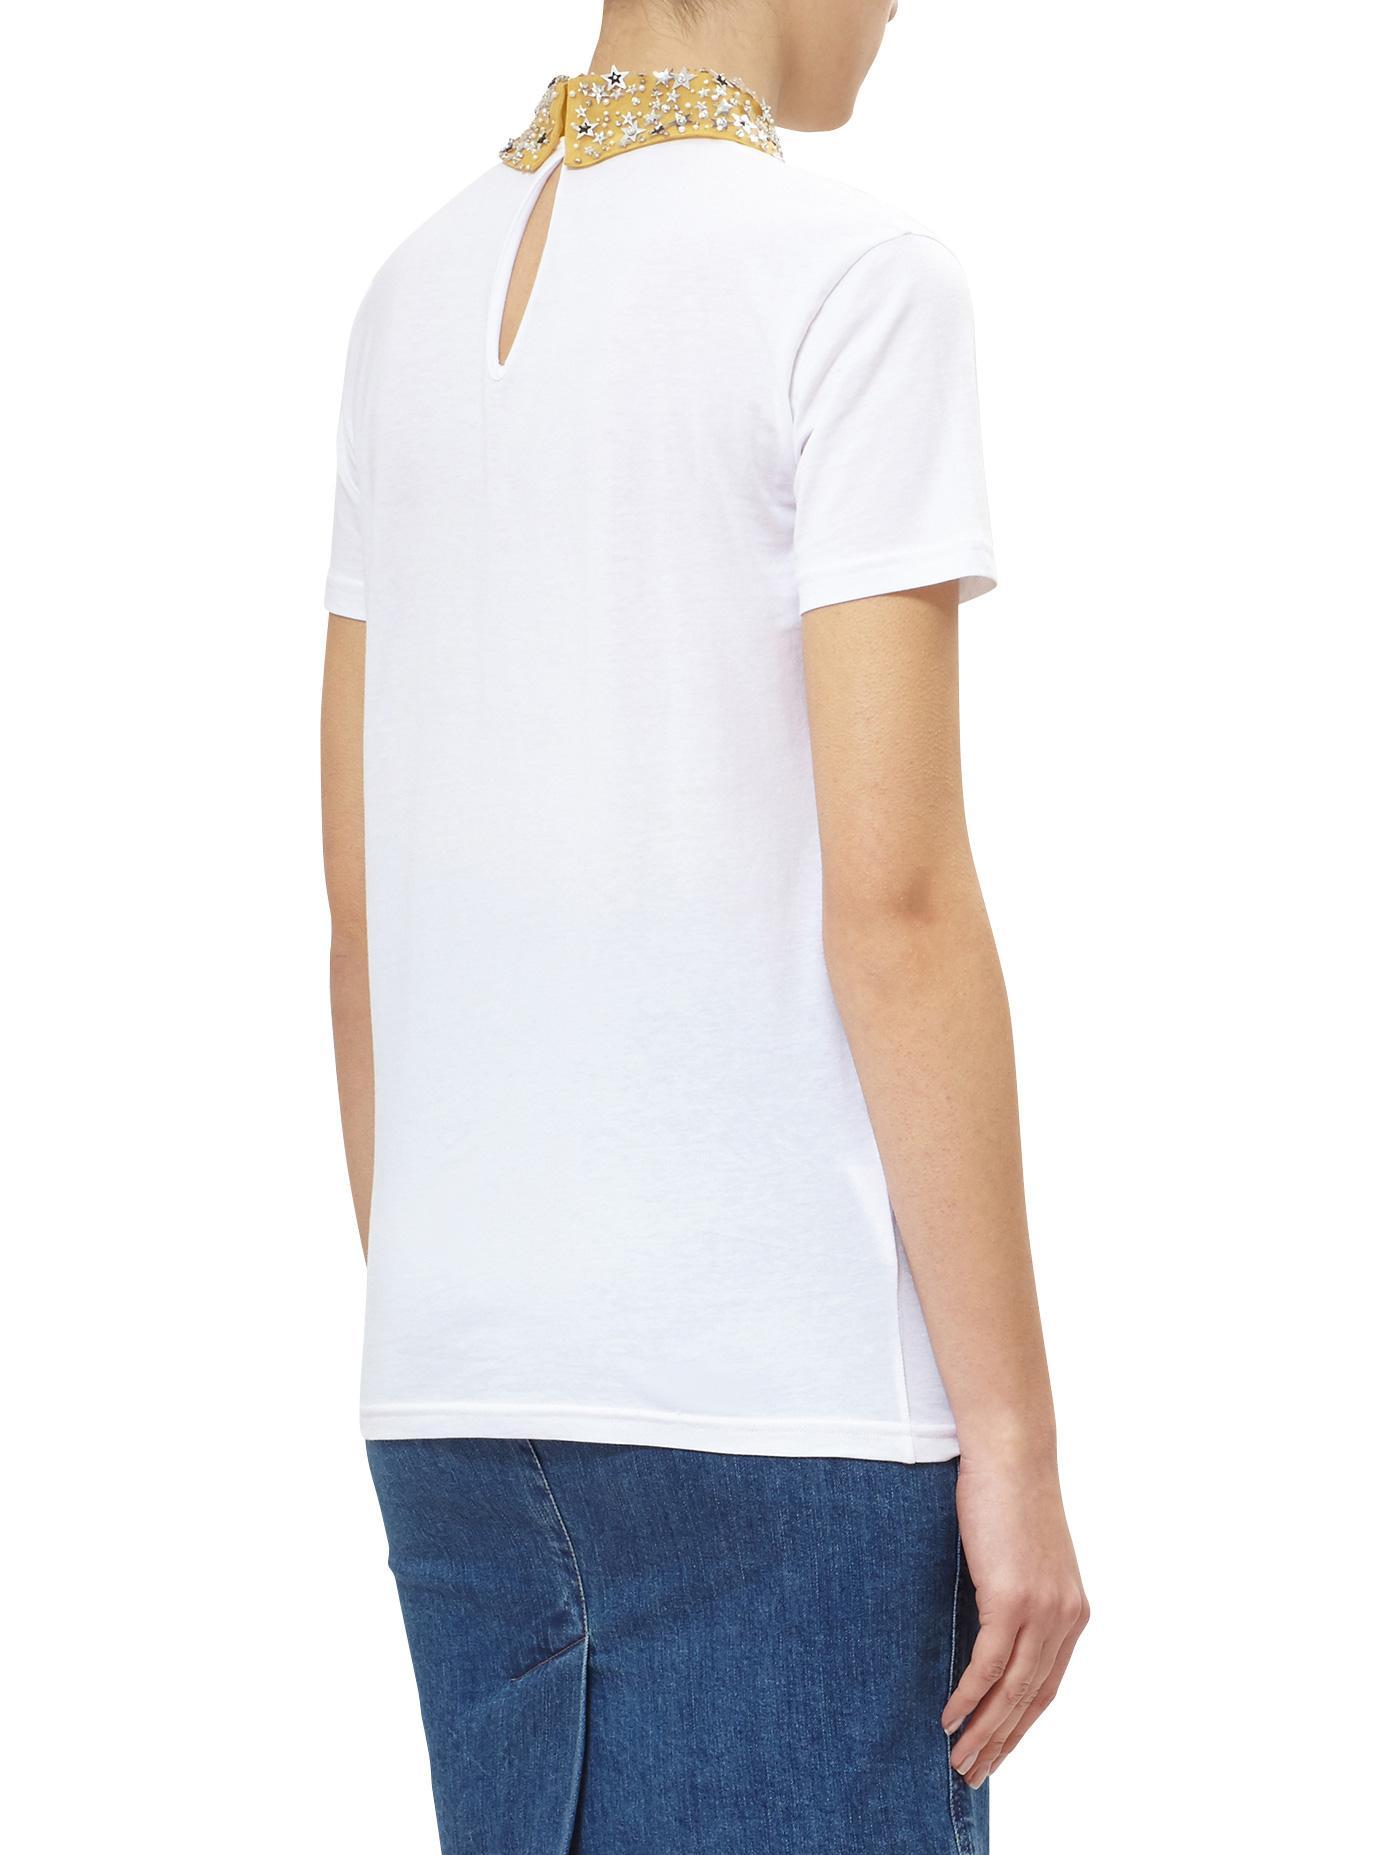 Lyst miu miu cotton t shirt with star collar in white for Miu miu t shirt